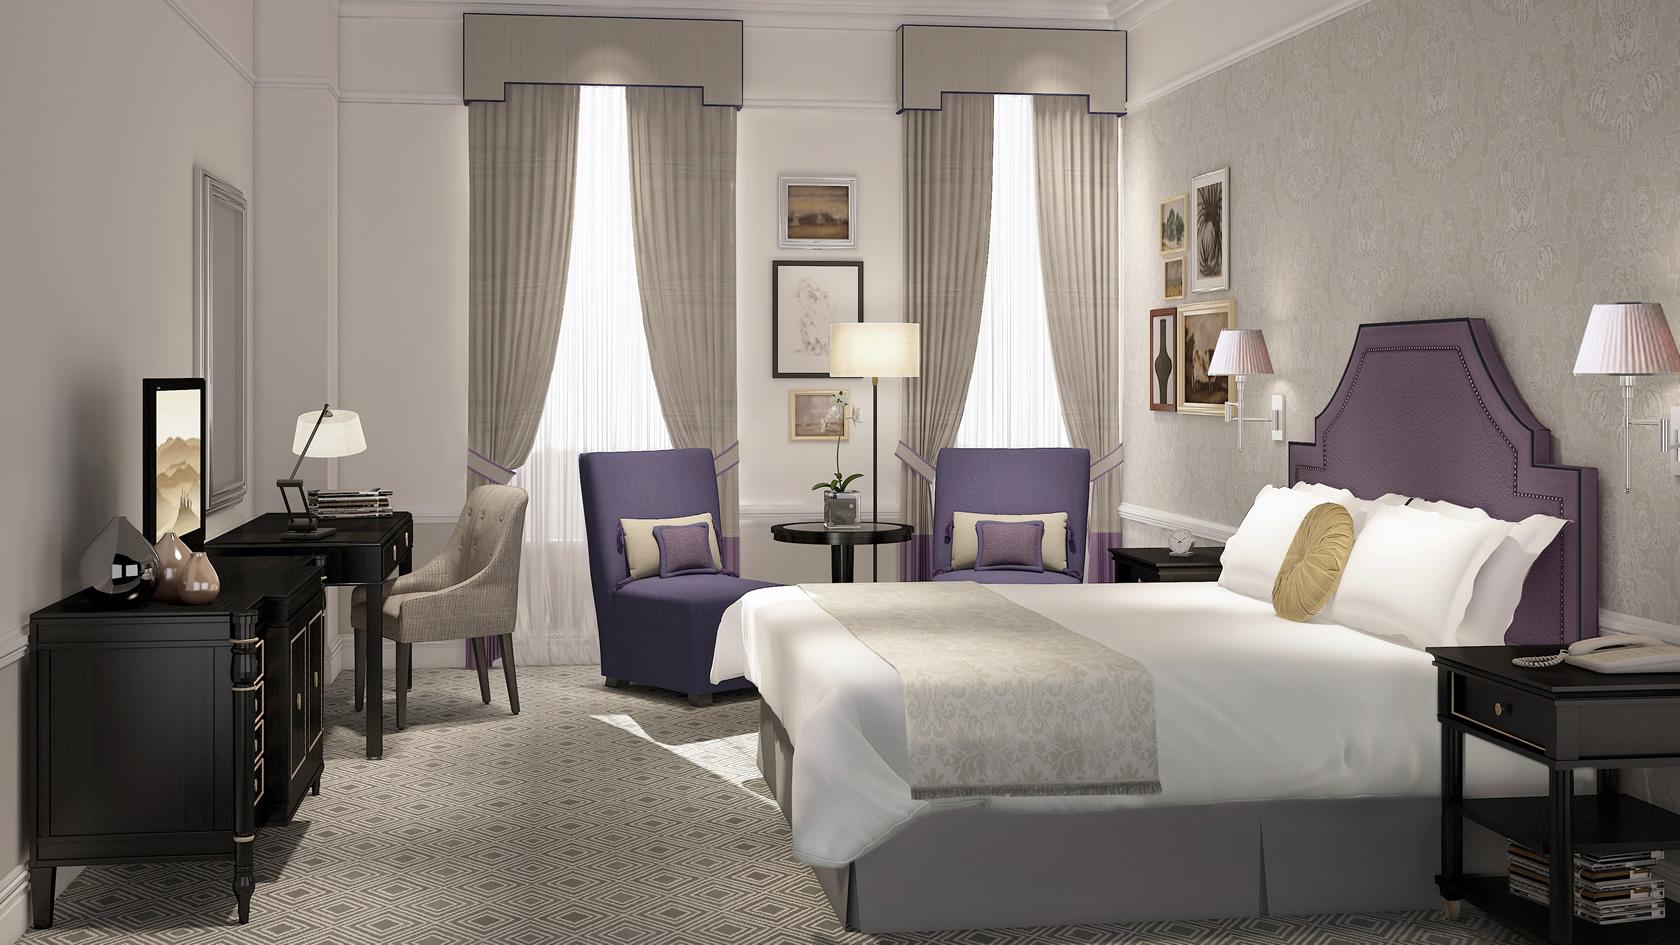 Rooms Review: Langham London New Regent Wing. TripReporter Preview